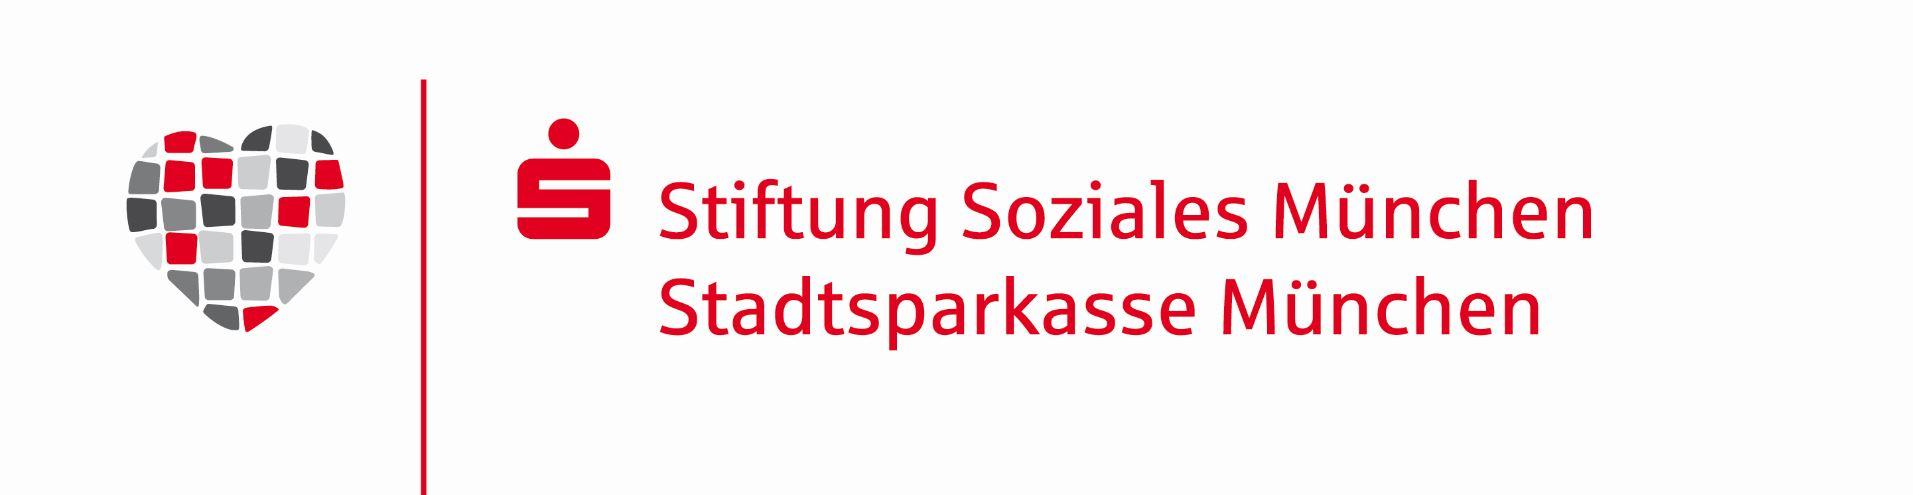 stiftung_soziales.JPG